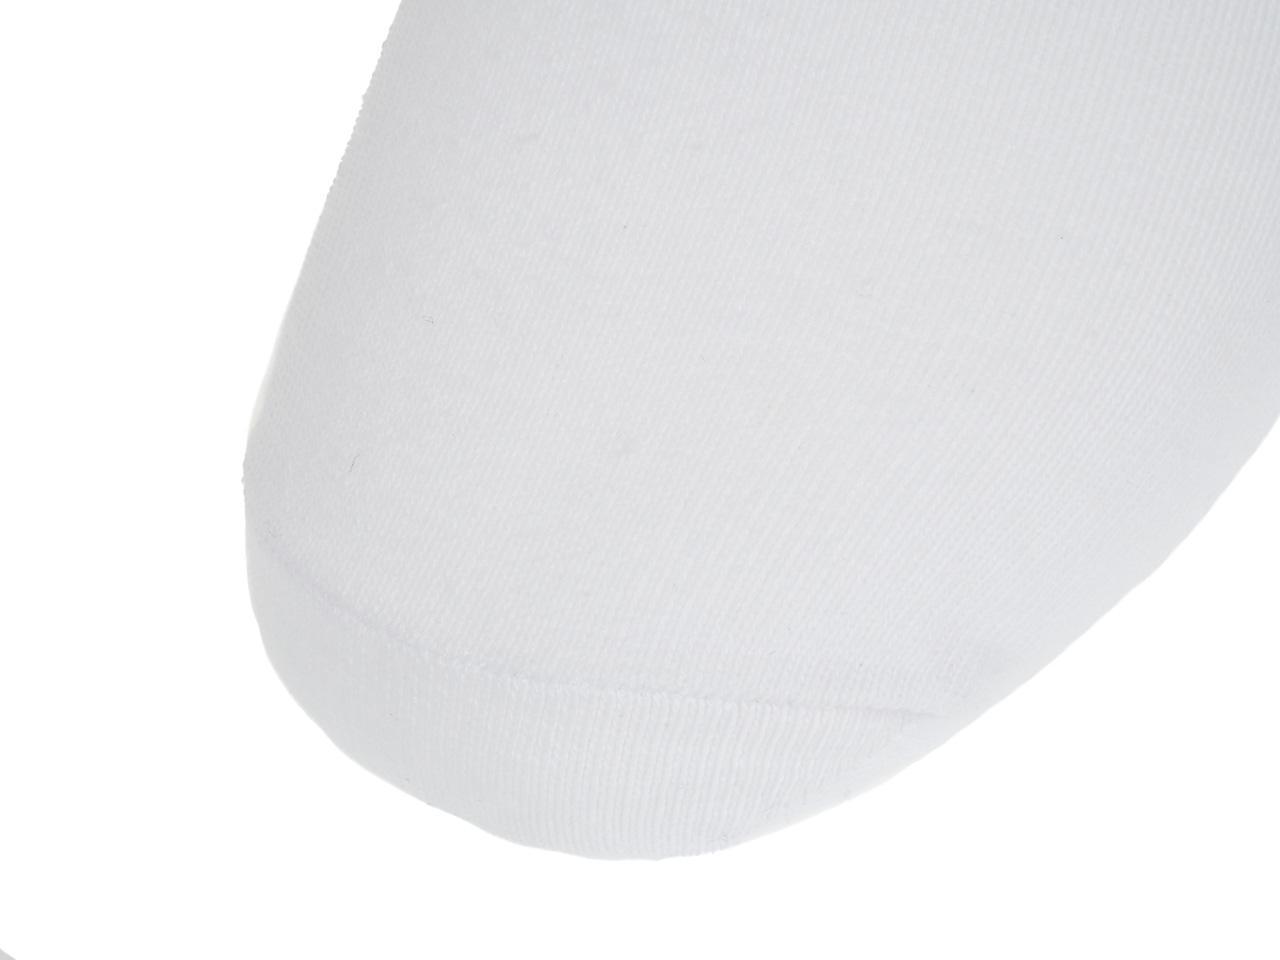 Chaussettes-Fila-Logo-blanc-quarter-par3-Blanc-43067-Neuf miniature 4